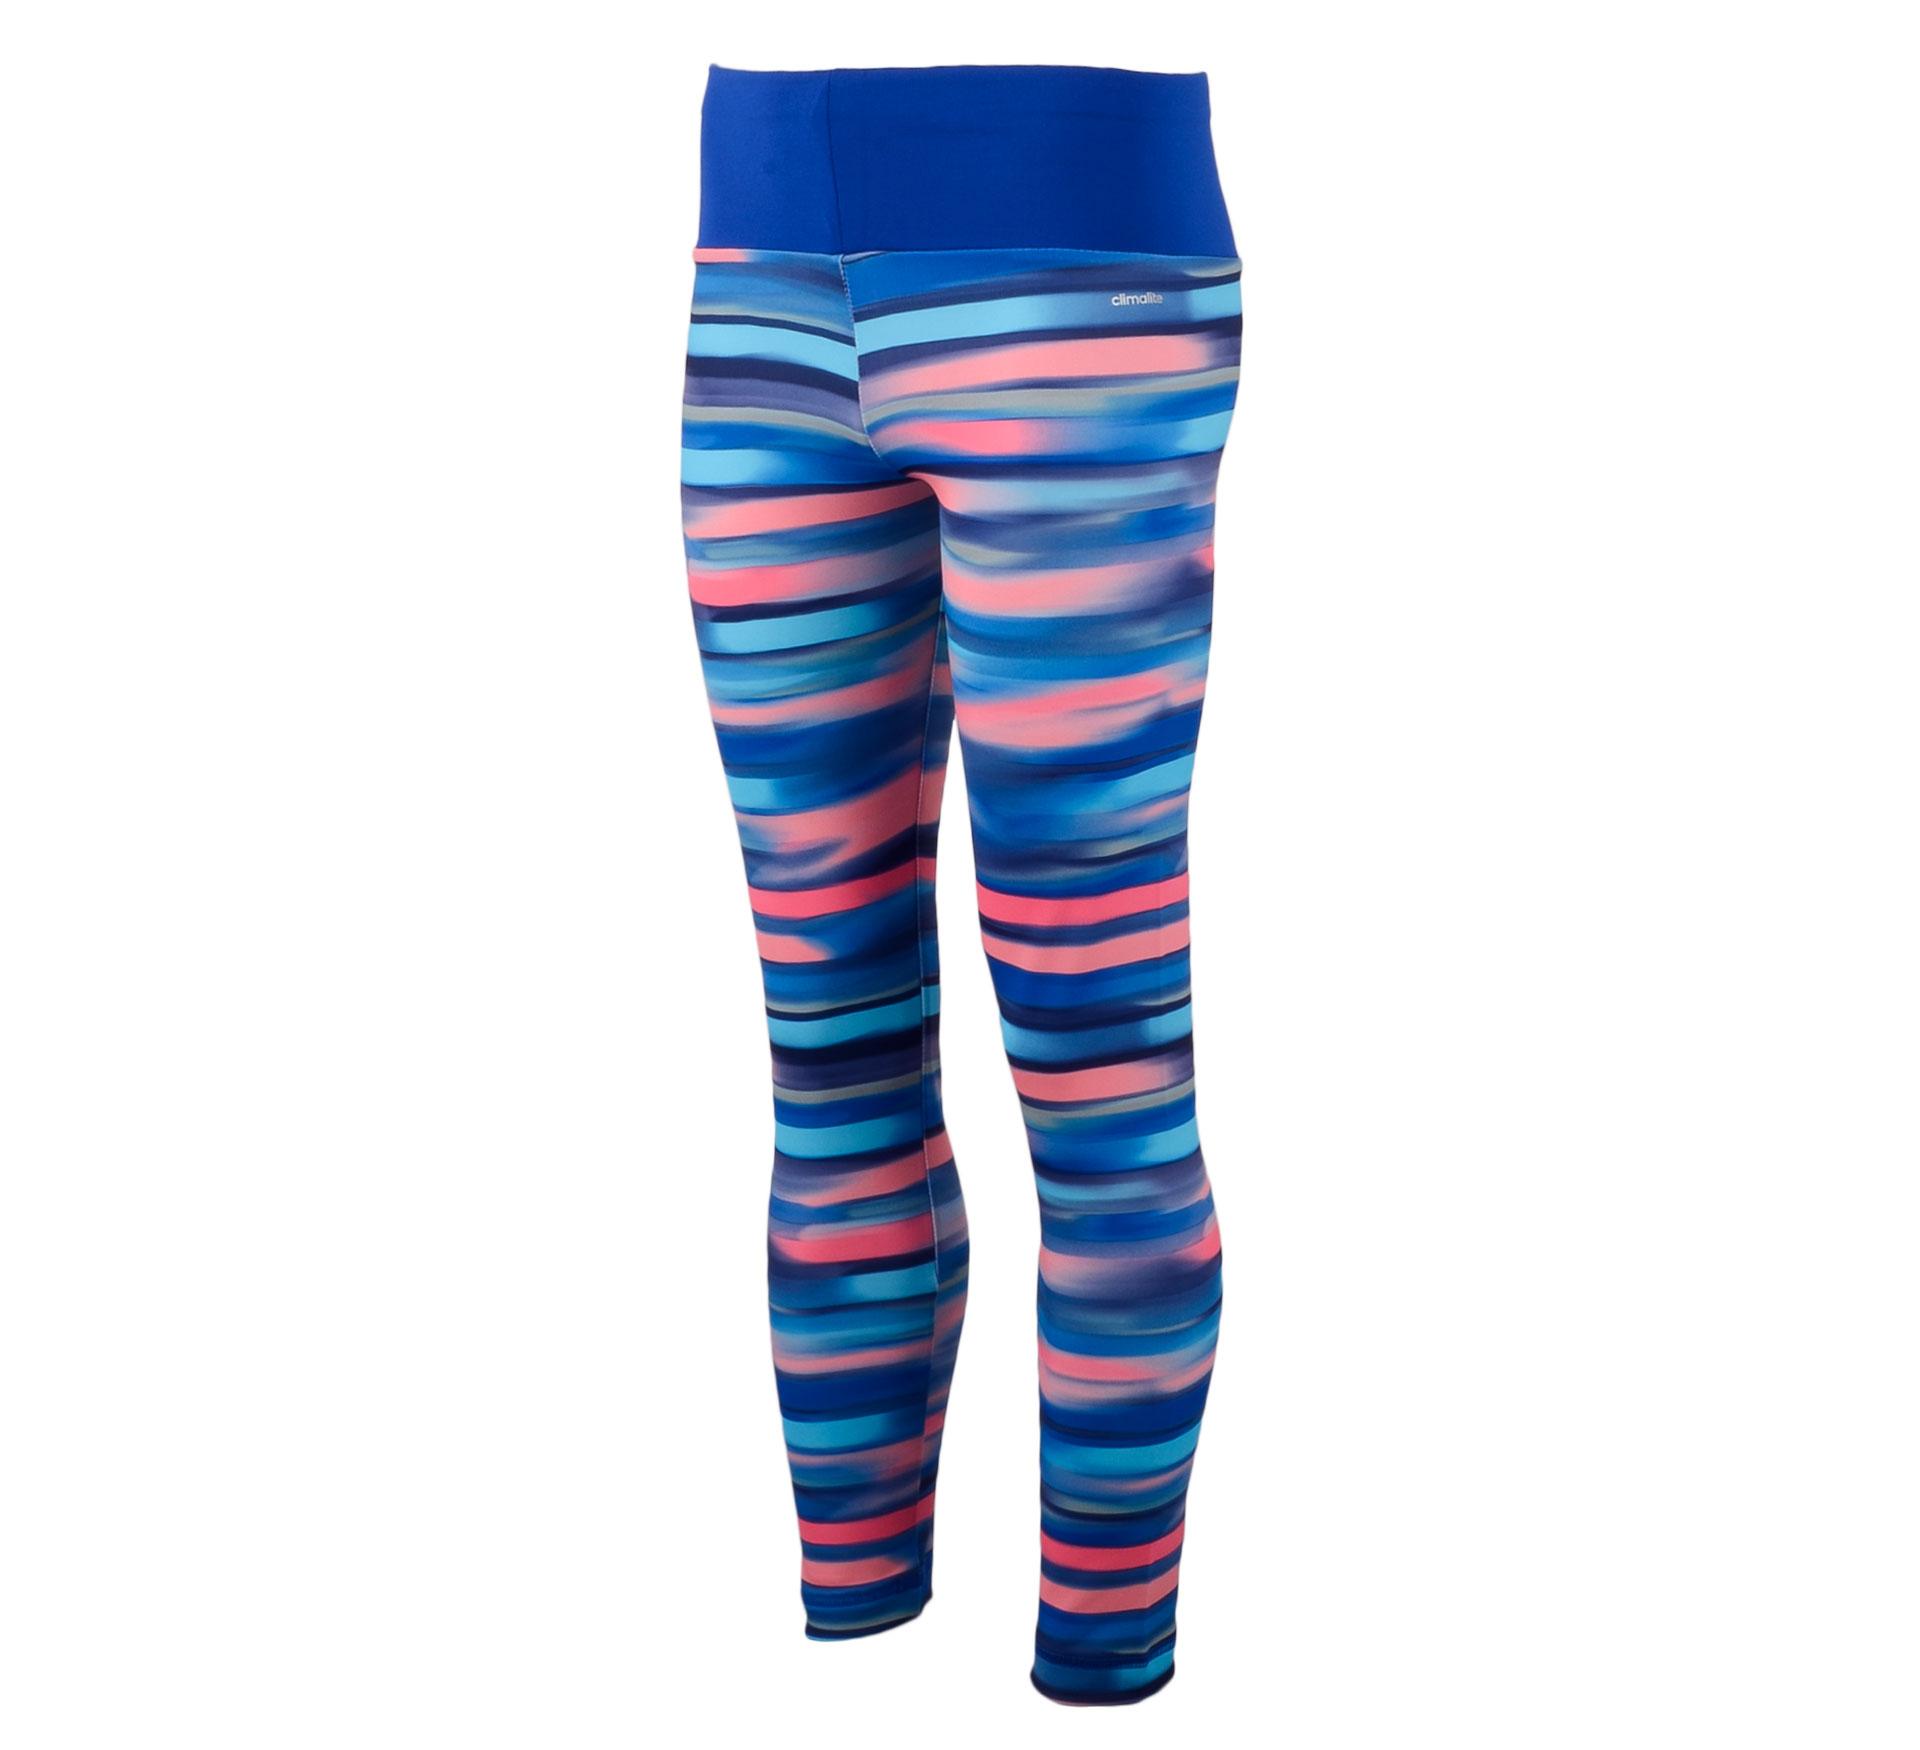 Adidas YG AIS Tight blauw - roze